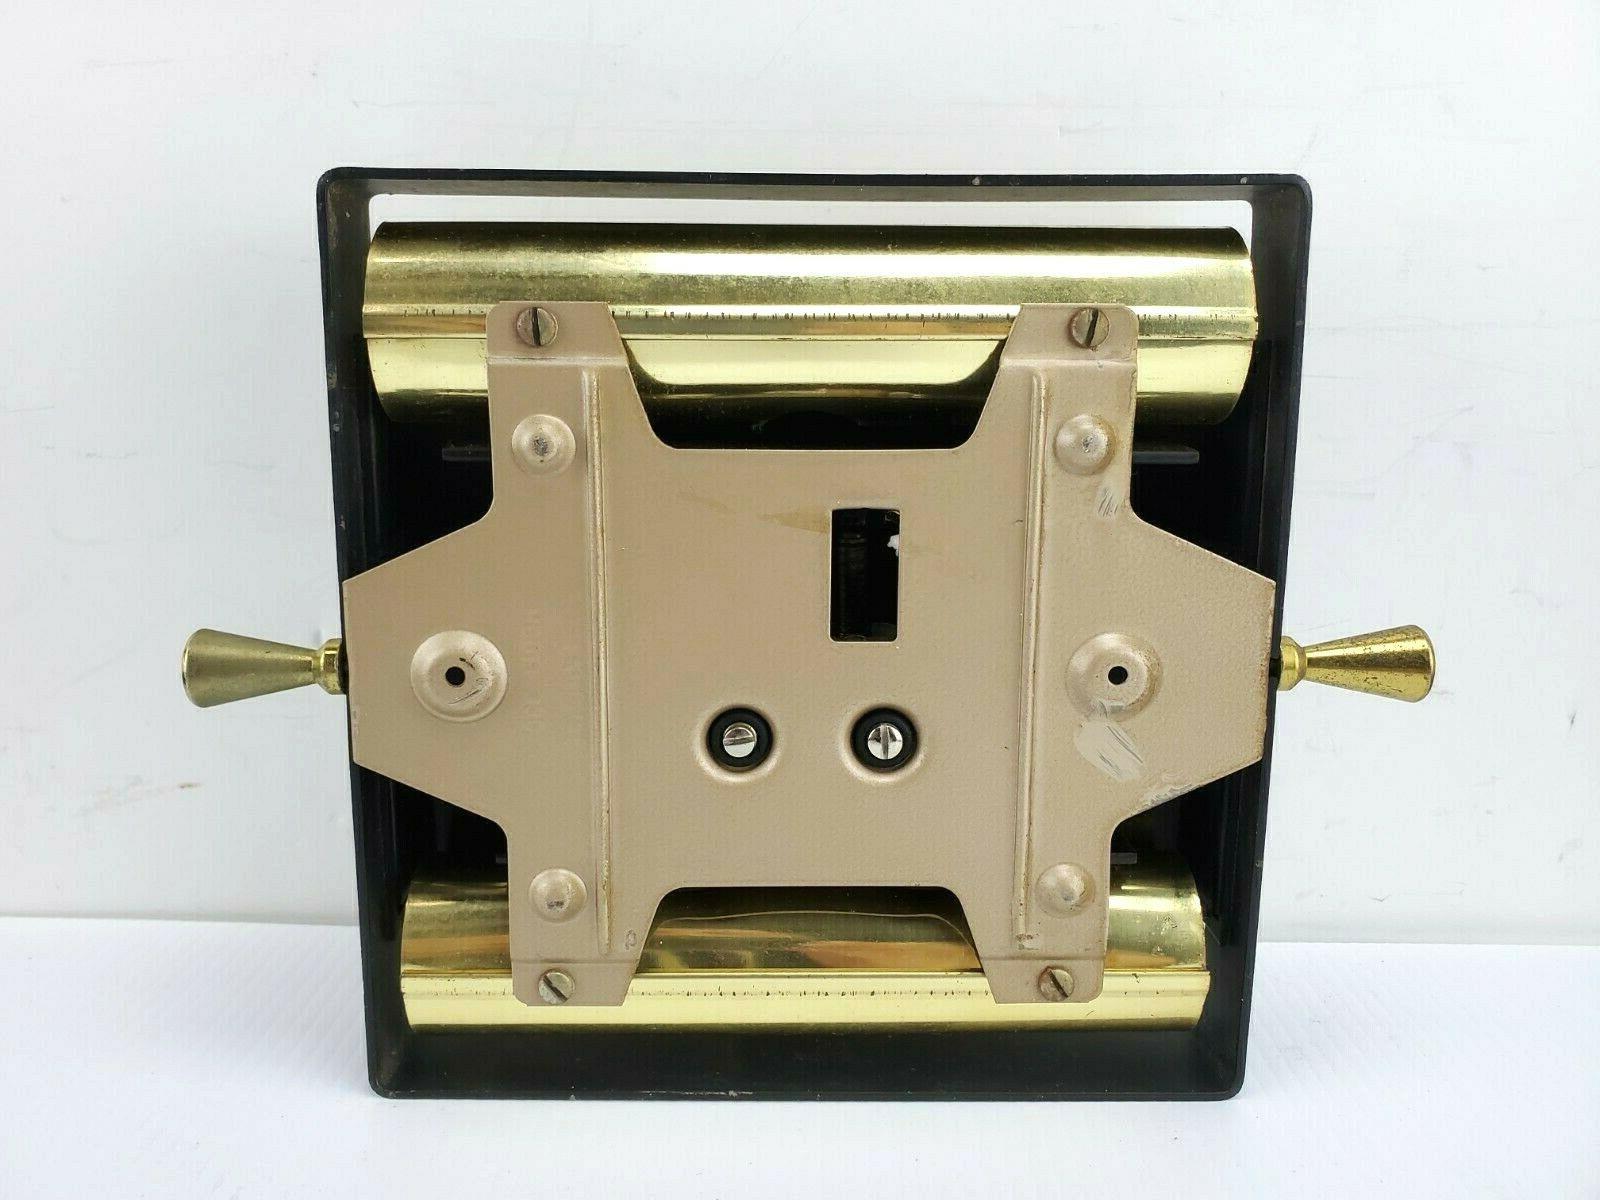 1960s RARE VINTAGE 330 DOOR CHIME BELL MID-CENTURY